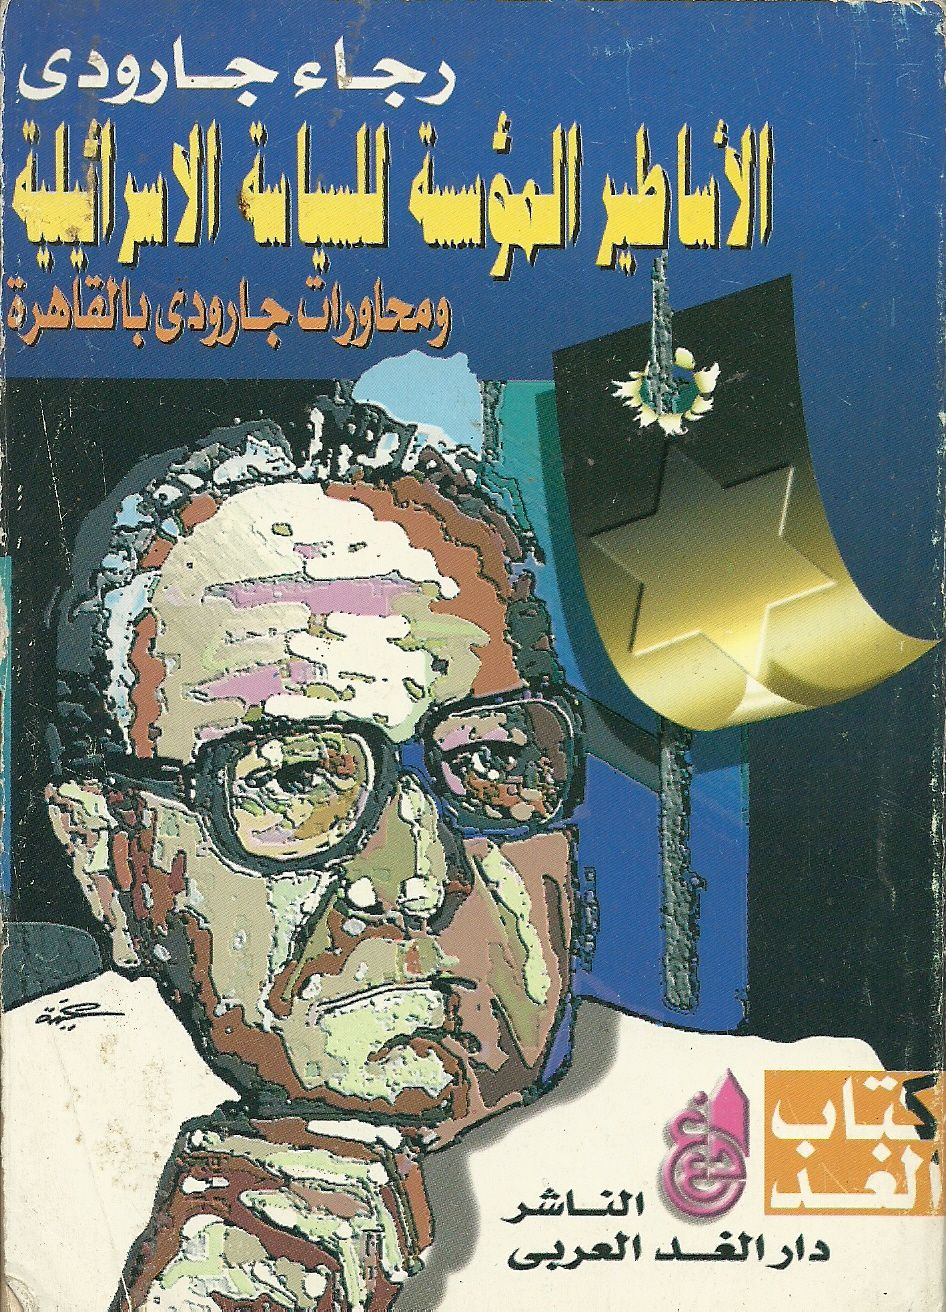 Pin By هاجر On فيها كتب قيمة Arabic Books Books Comic Books